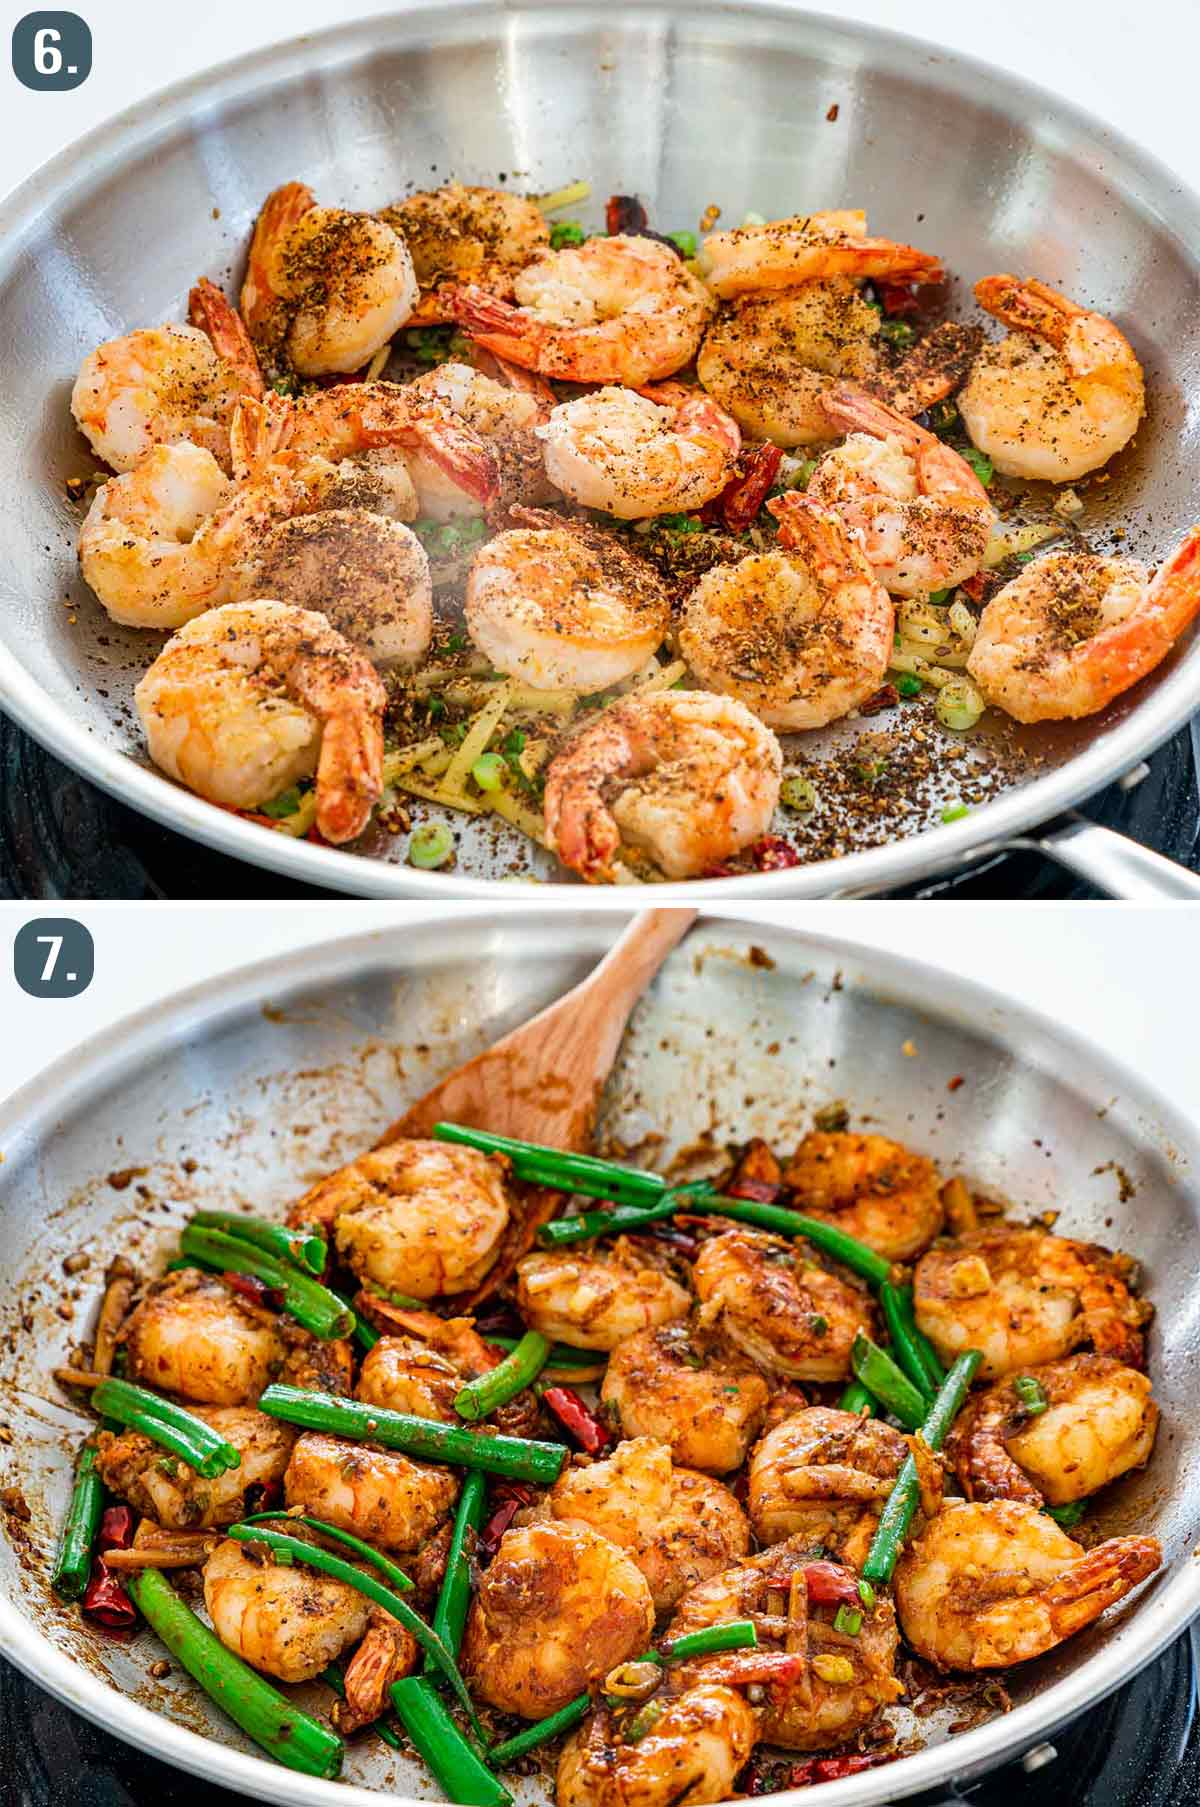 szechuan shrimp before and after adding sauce.